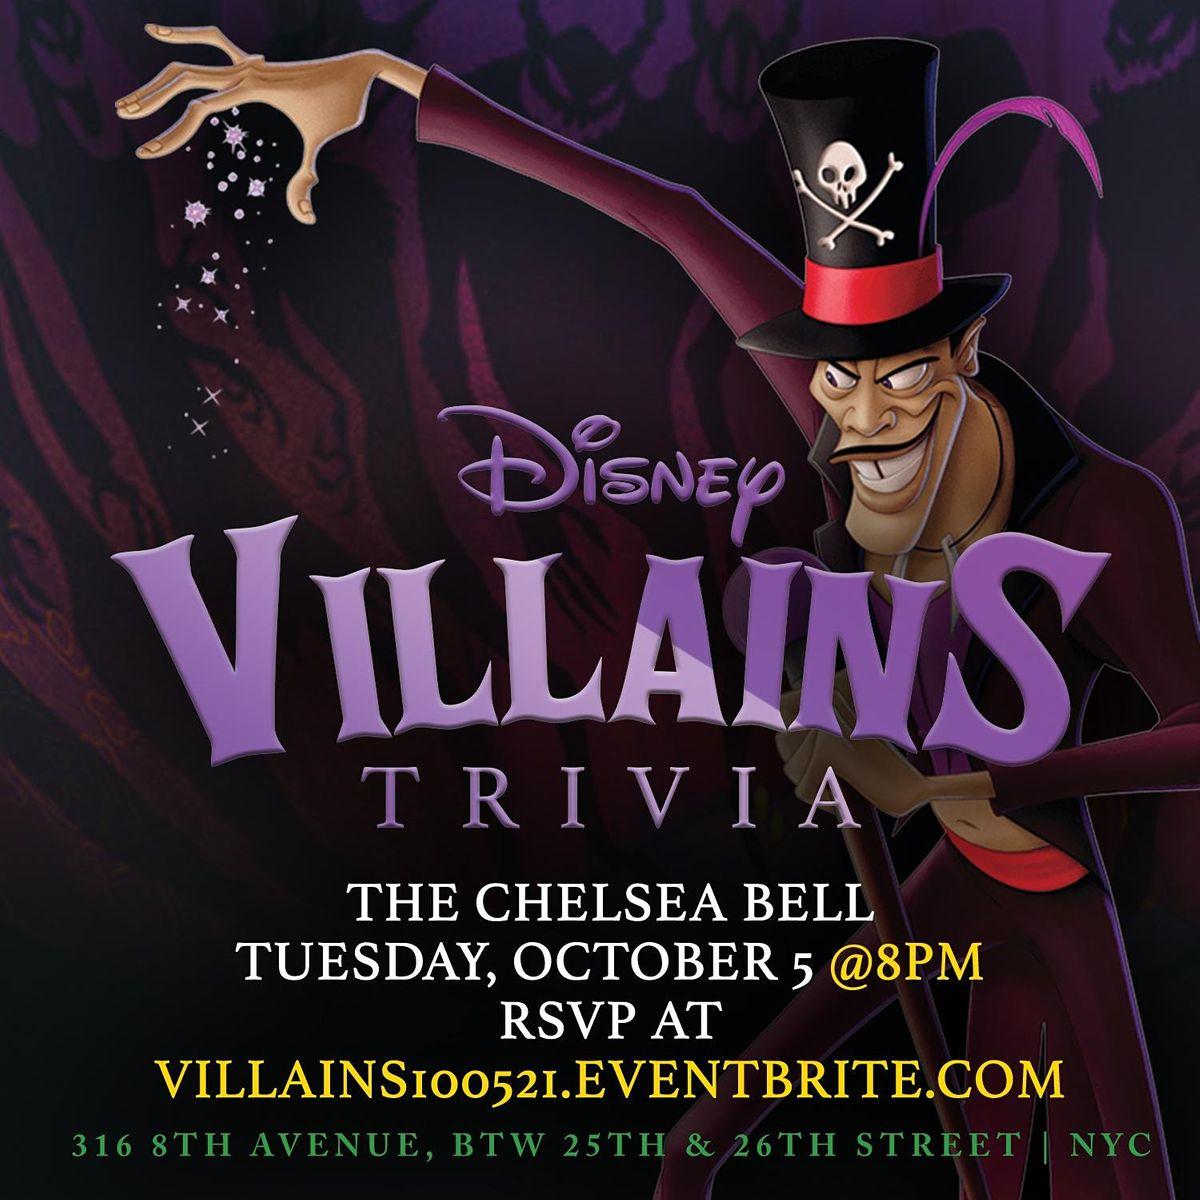 Disney Villains Trivia, 5 October | Event in New York | AllEvents.in